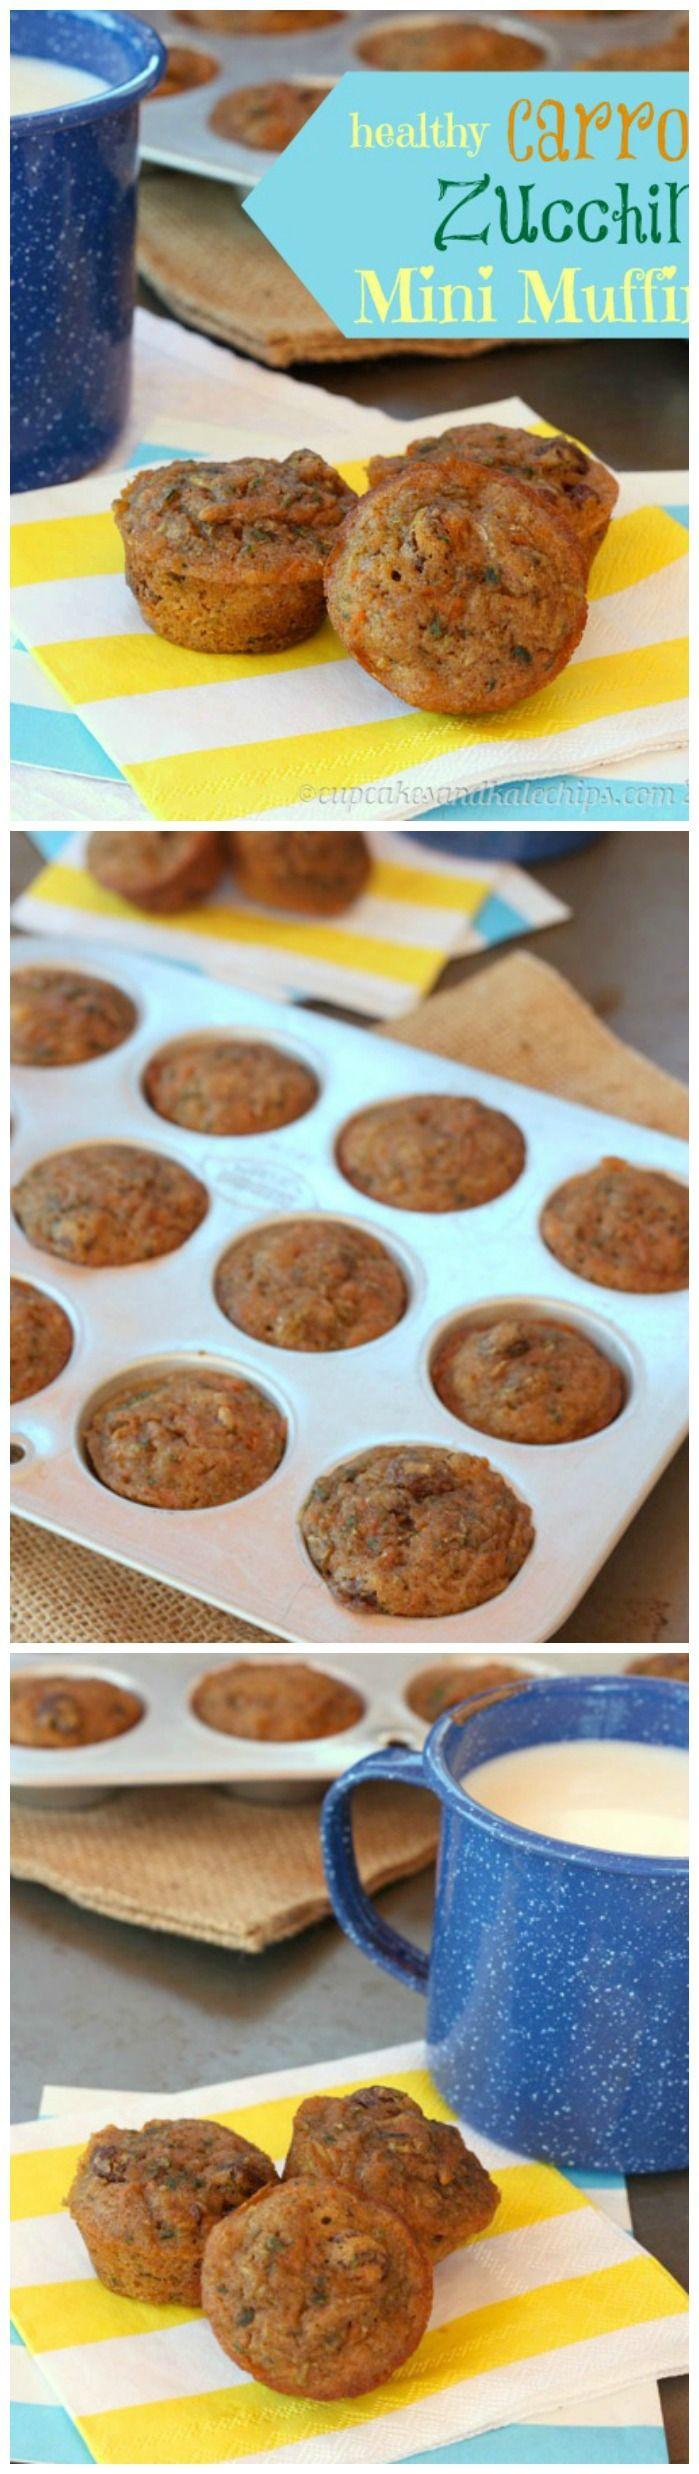 Healthy Carrot Zuchini Mini Muffins